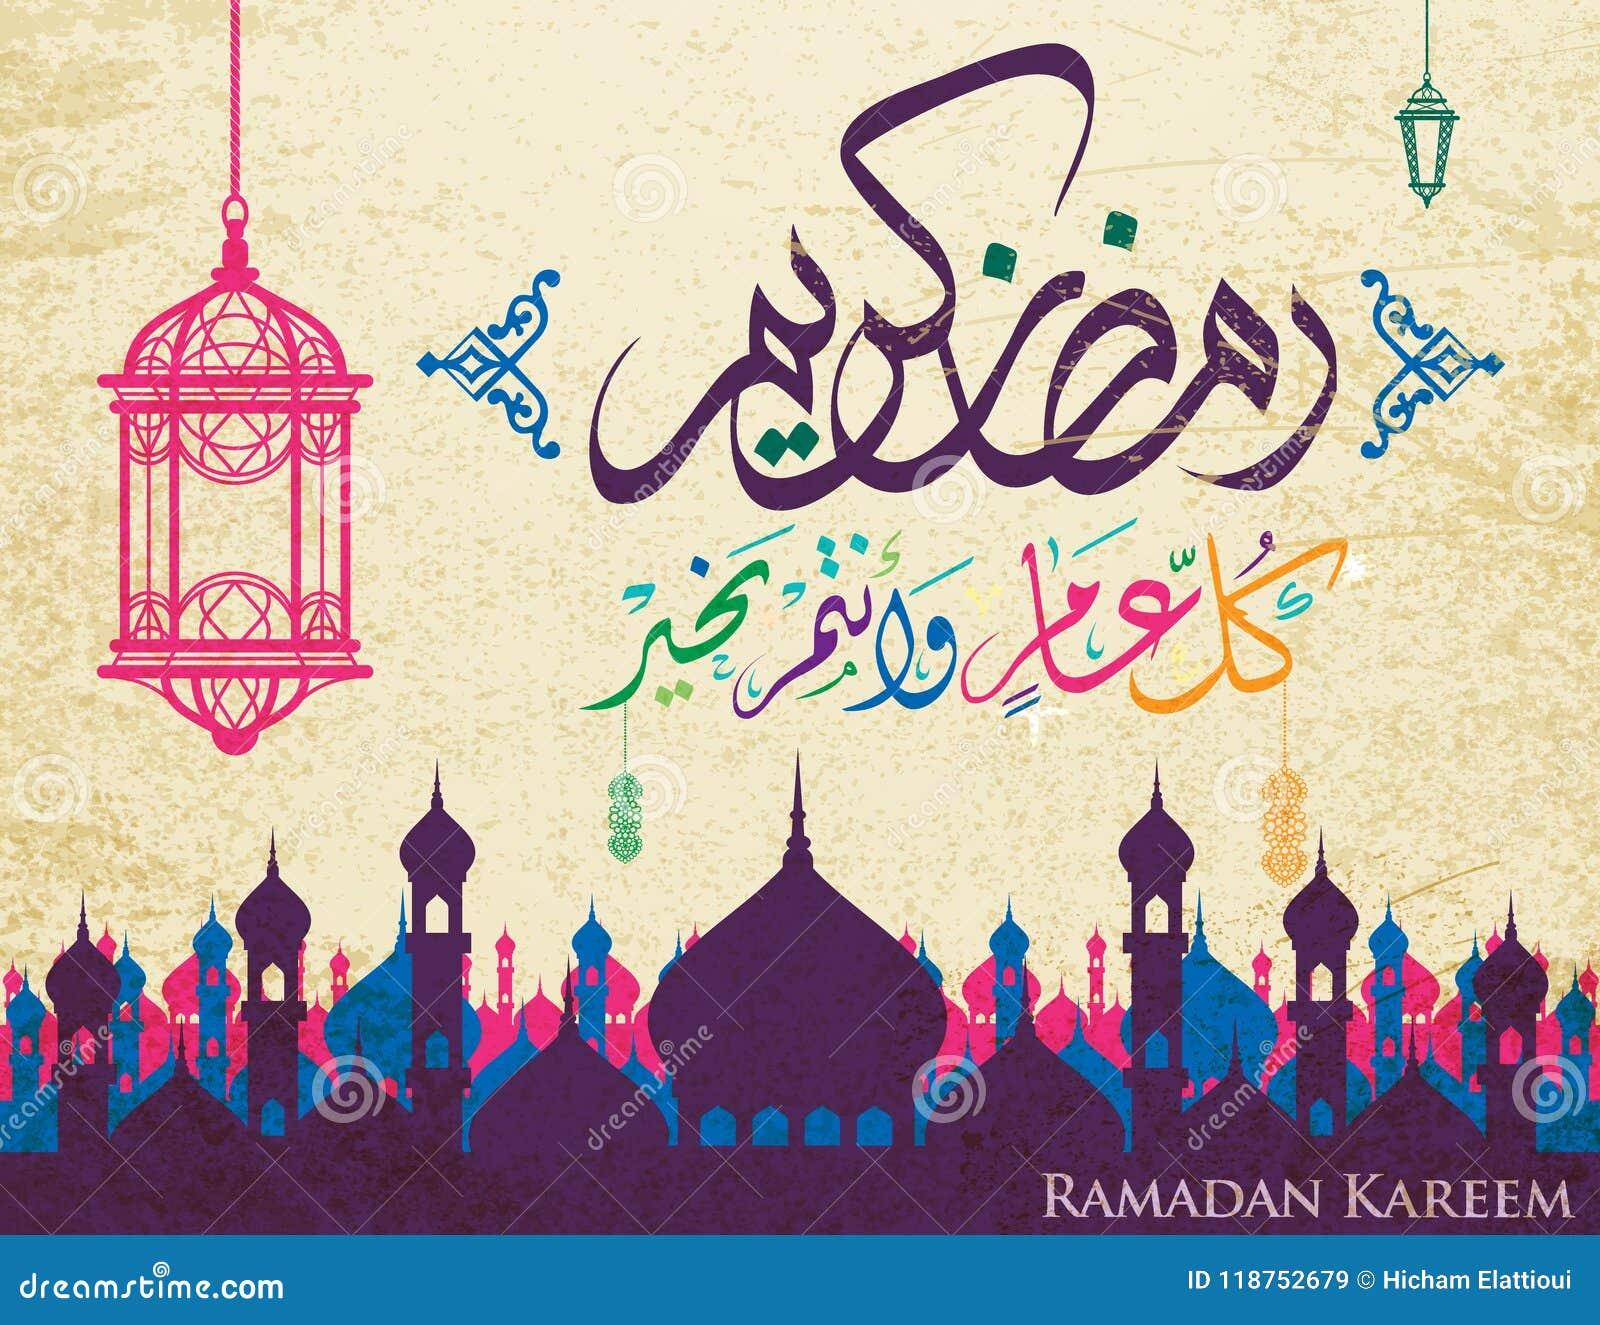 Ramadan kareem islamic greeting with arabic calligraphy stock vector download ramadan kareem islamic greeting with arabic calligraphy stock vector illustration of arabesque fitr m4hsunfo